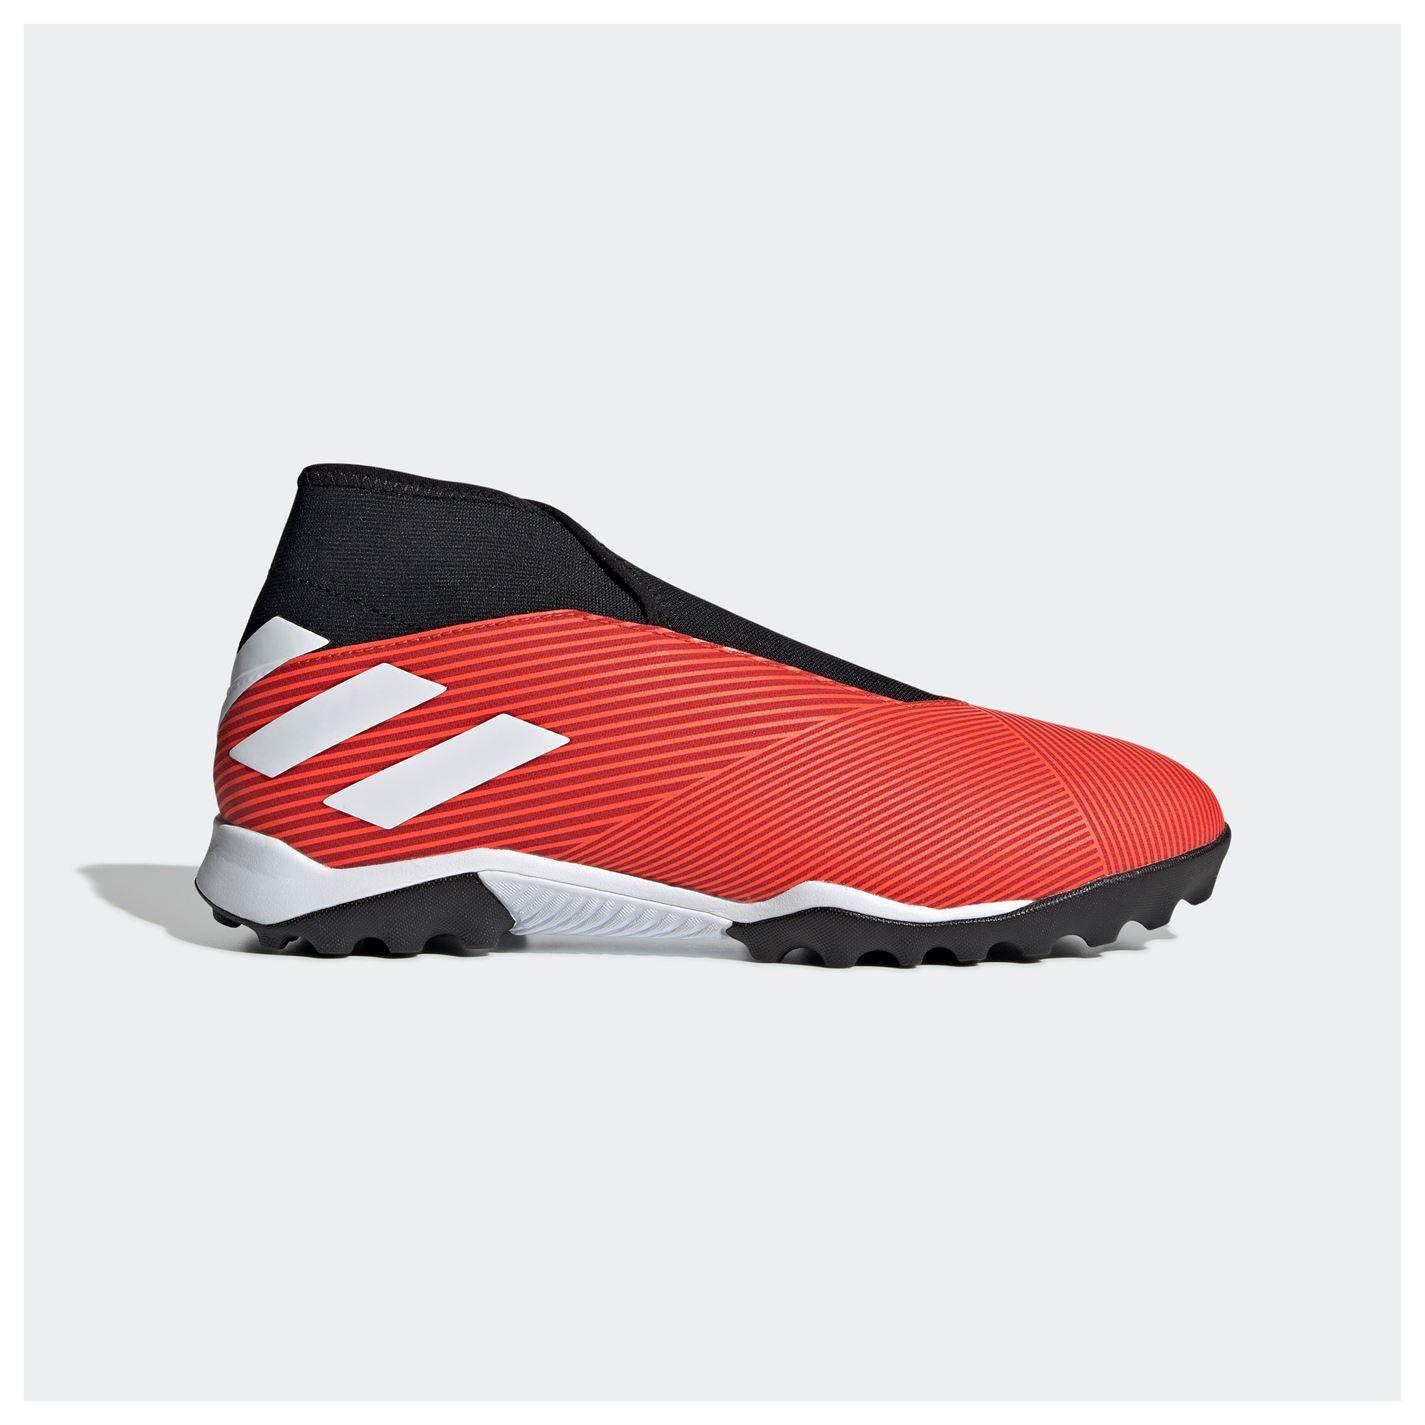 adidas Nemeziz 19.3 Laceless Astro Turf Football Shoes Mens Soccer ...